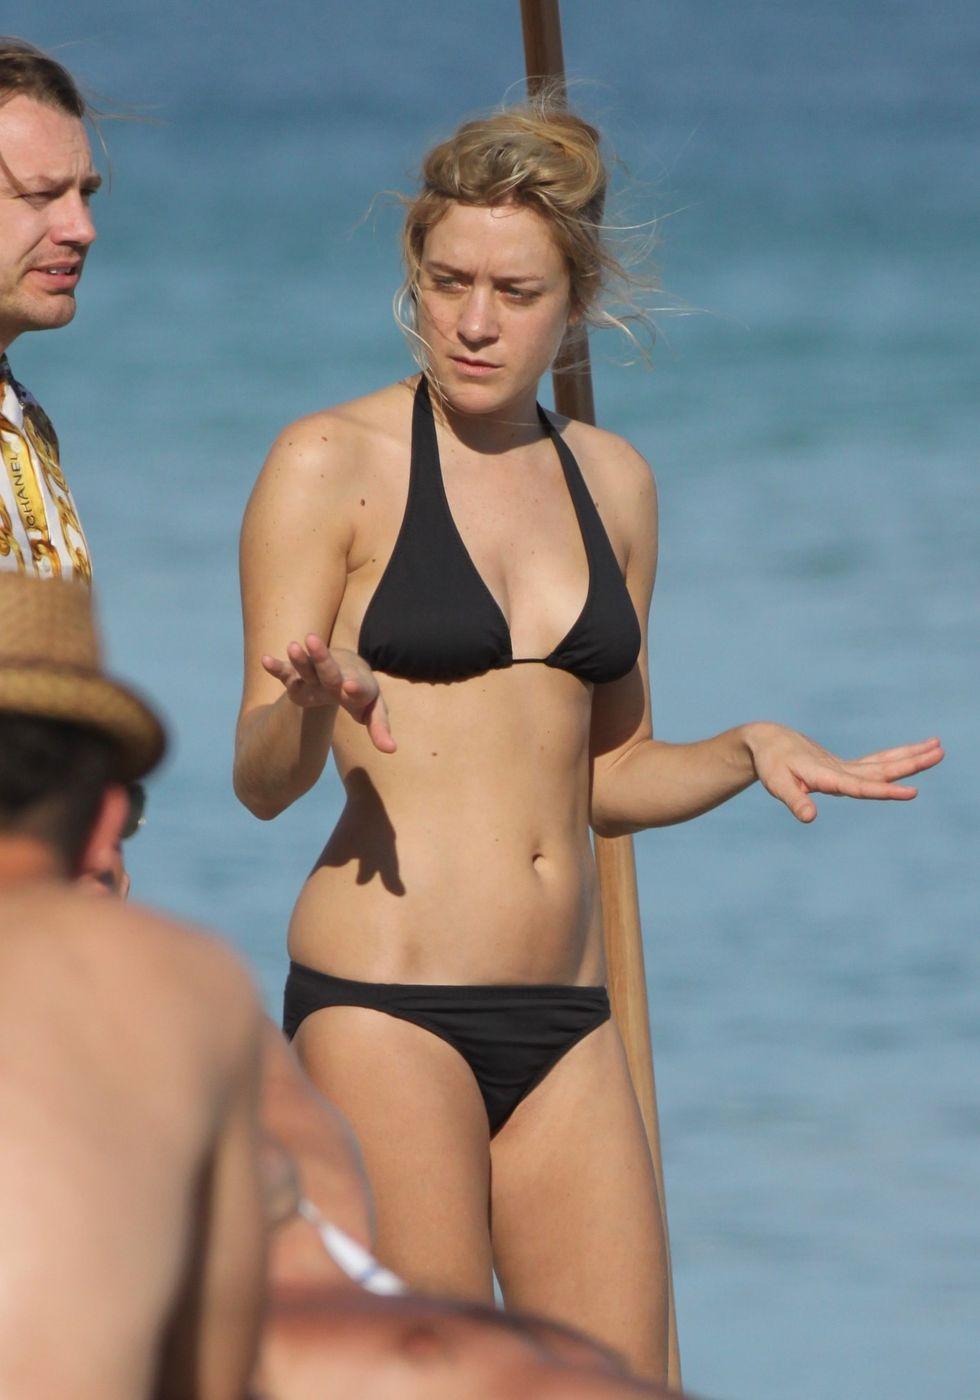 chloe-sevigny-bikini-candids-at-miami-beach-01